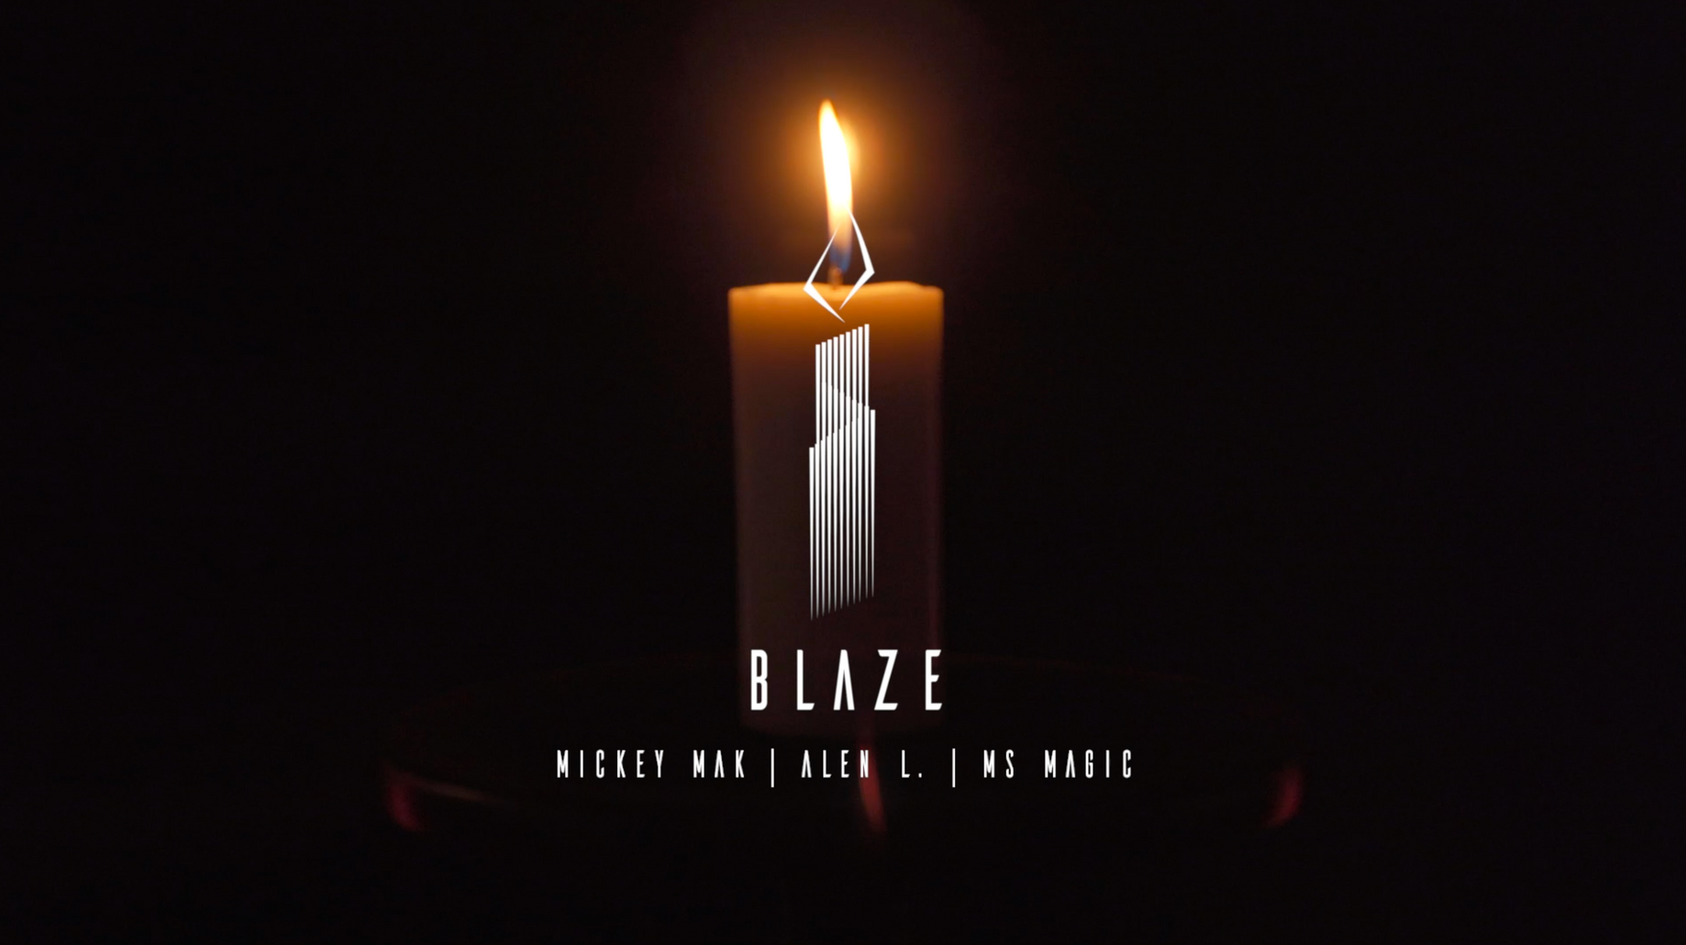 BLAZE The Auto Candle